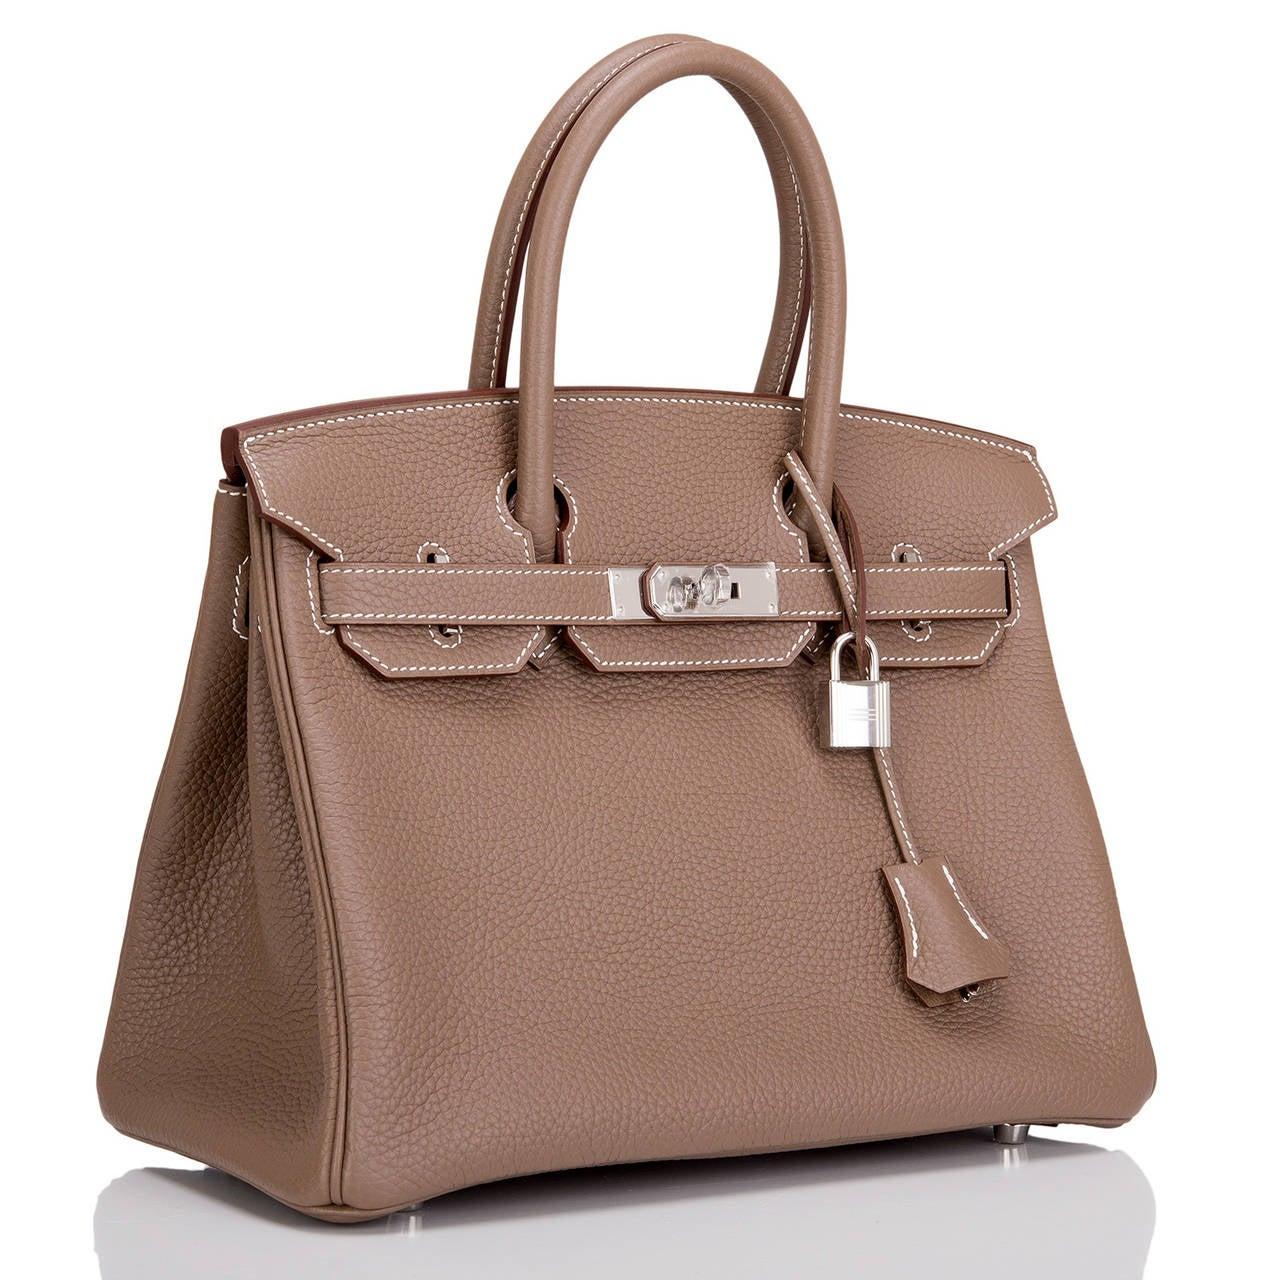 hermes paris handbags - Hermes Etoupe Clemence Birkin 30cm Palladium Hardware at 1stdibs